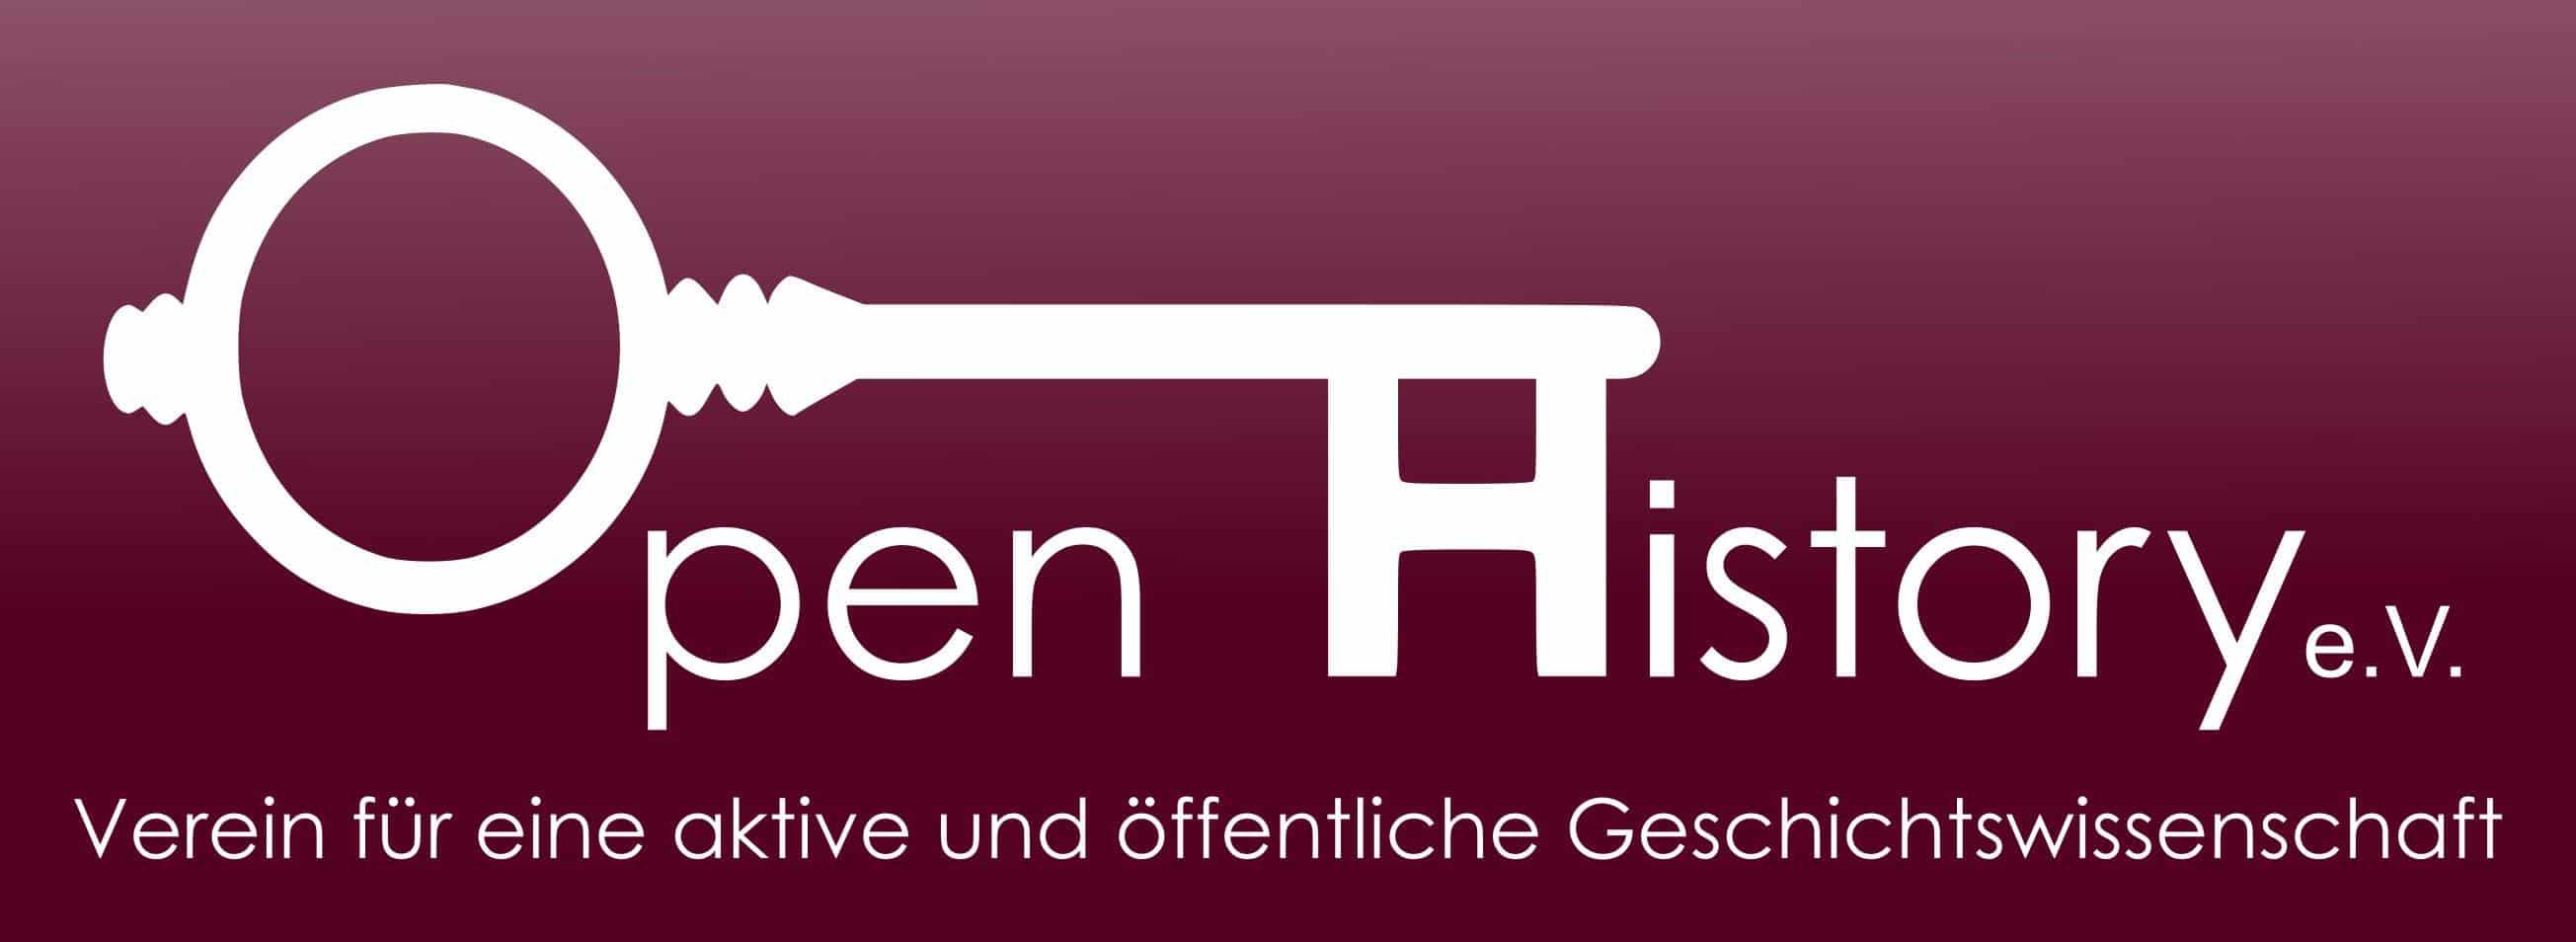 Open History e. V.